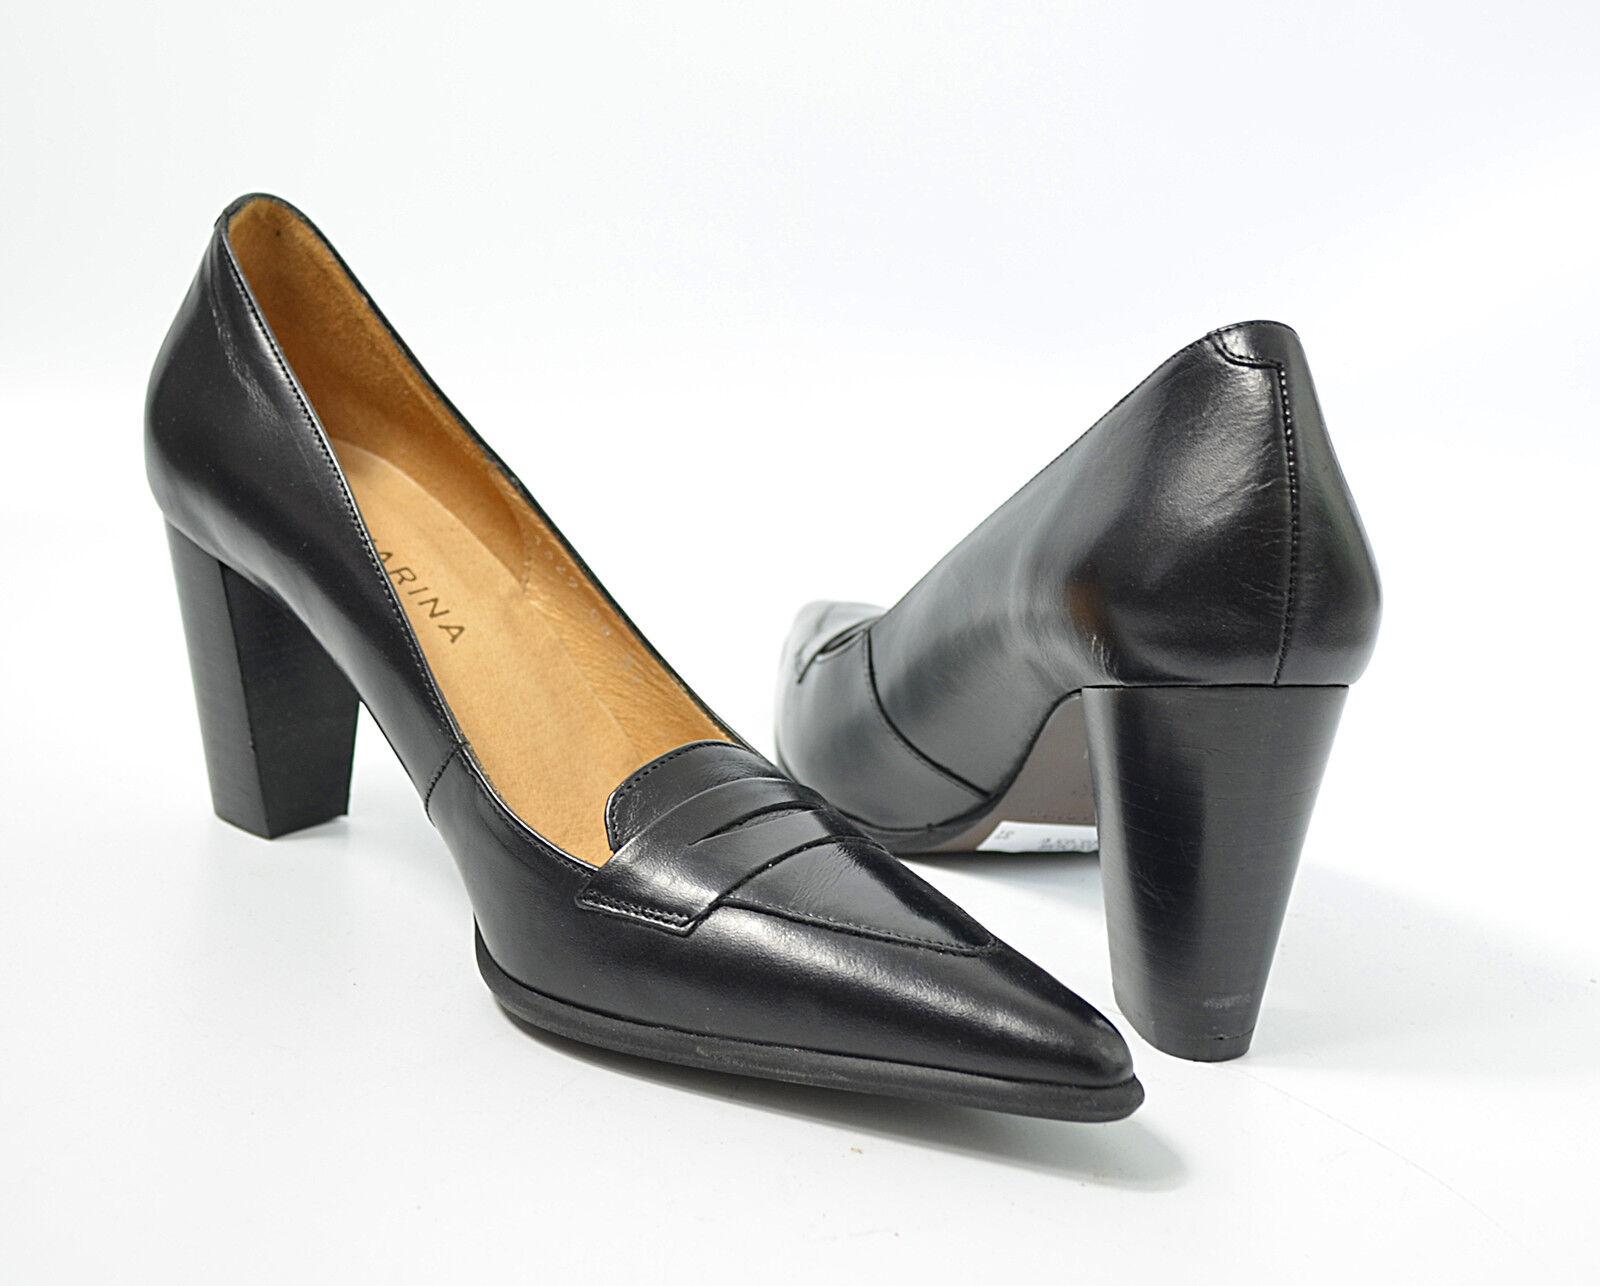 San Marina aliasa Décolleté Mis. 36,37,40, UVP , cuoio, scarpe da donna v1 05/17 m3